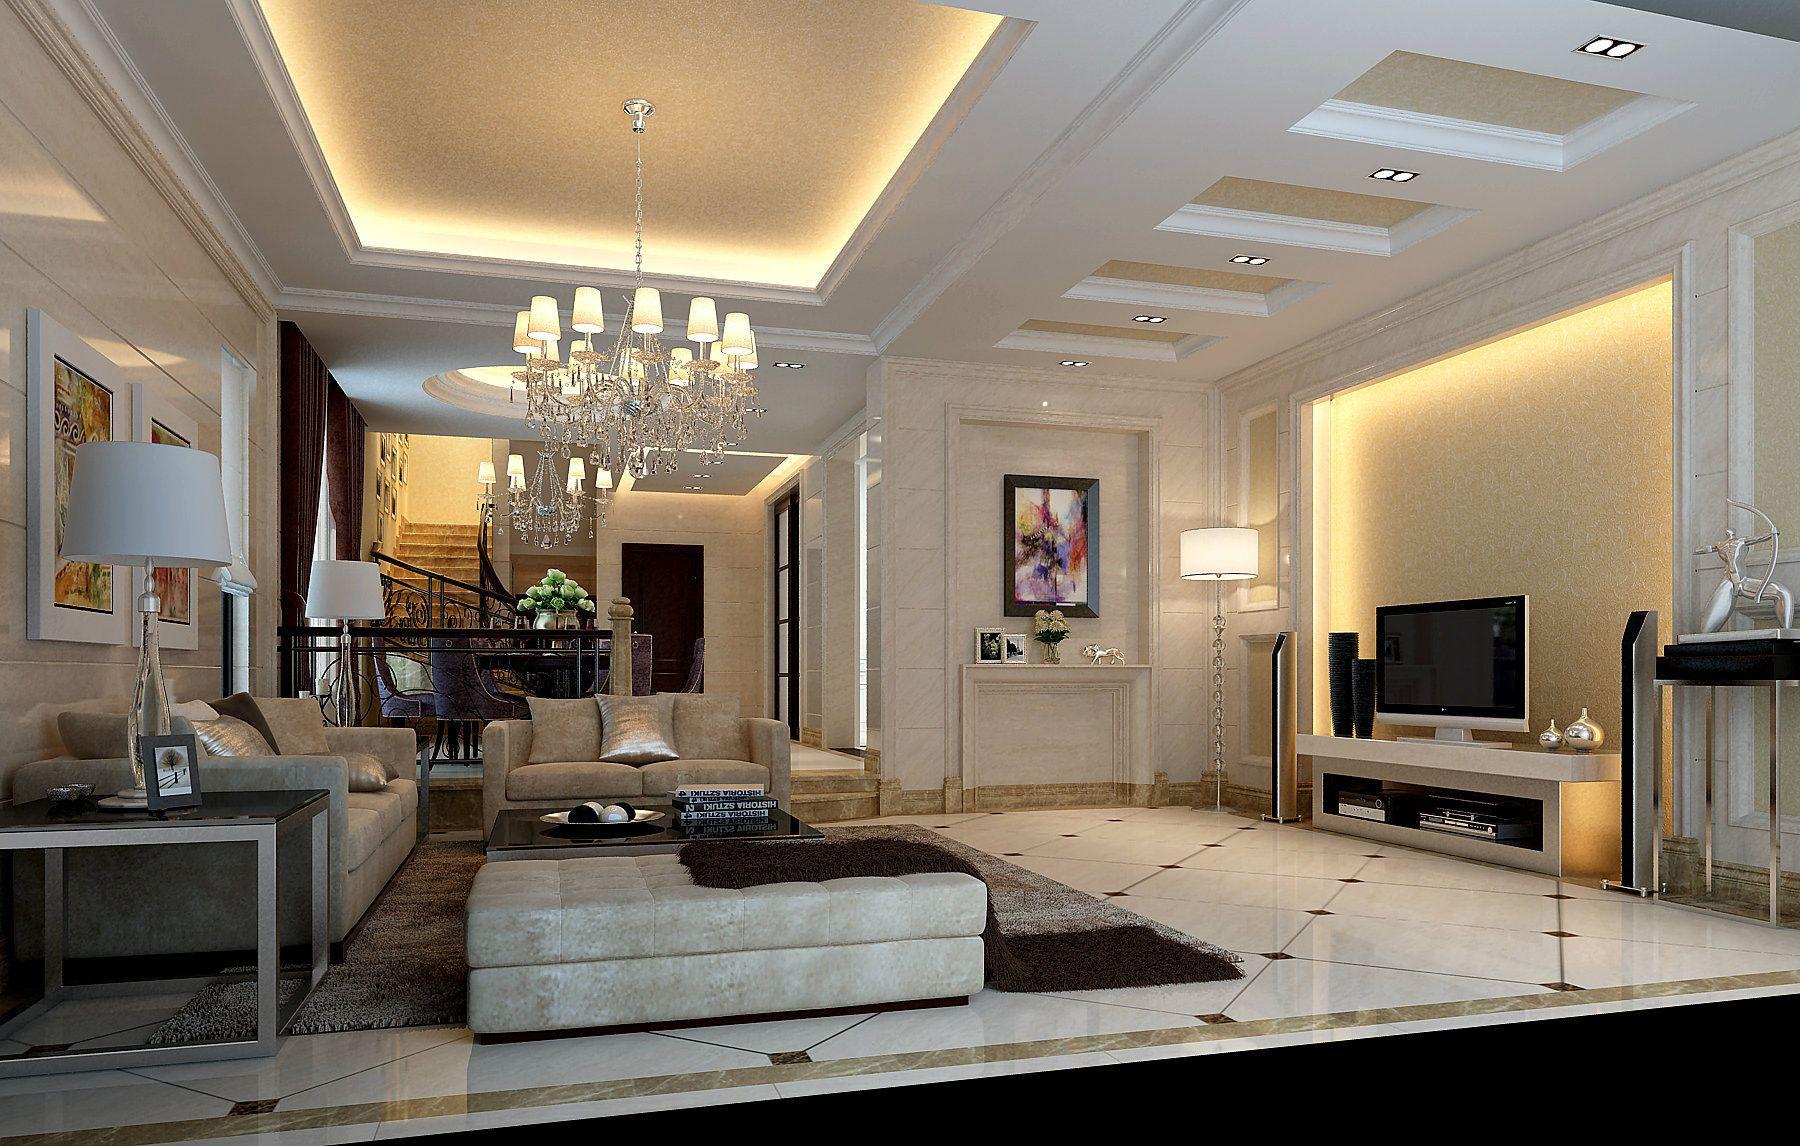 living room interior design 2016 warm color schemes for rooms modern designs